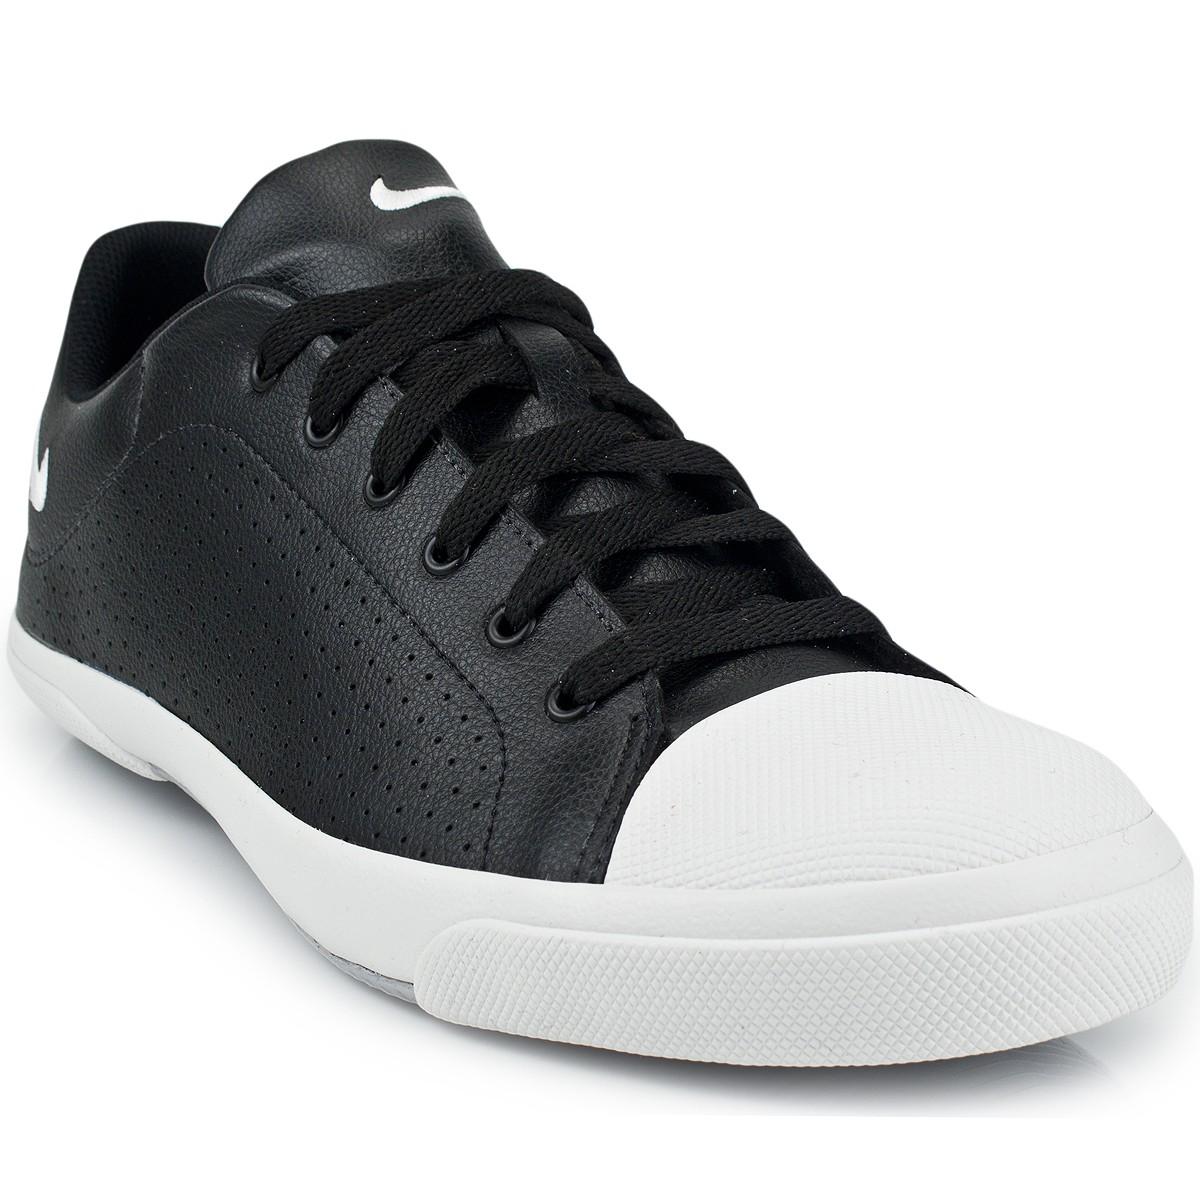 2d687869d03 Tênis Nike Biscuit 2 SL 651857 ...